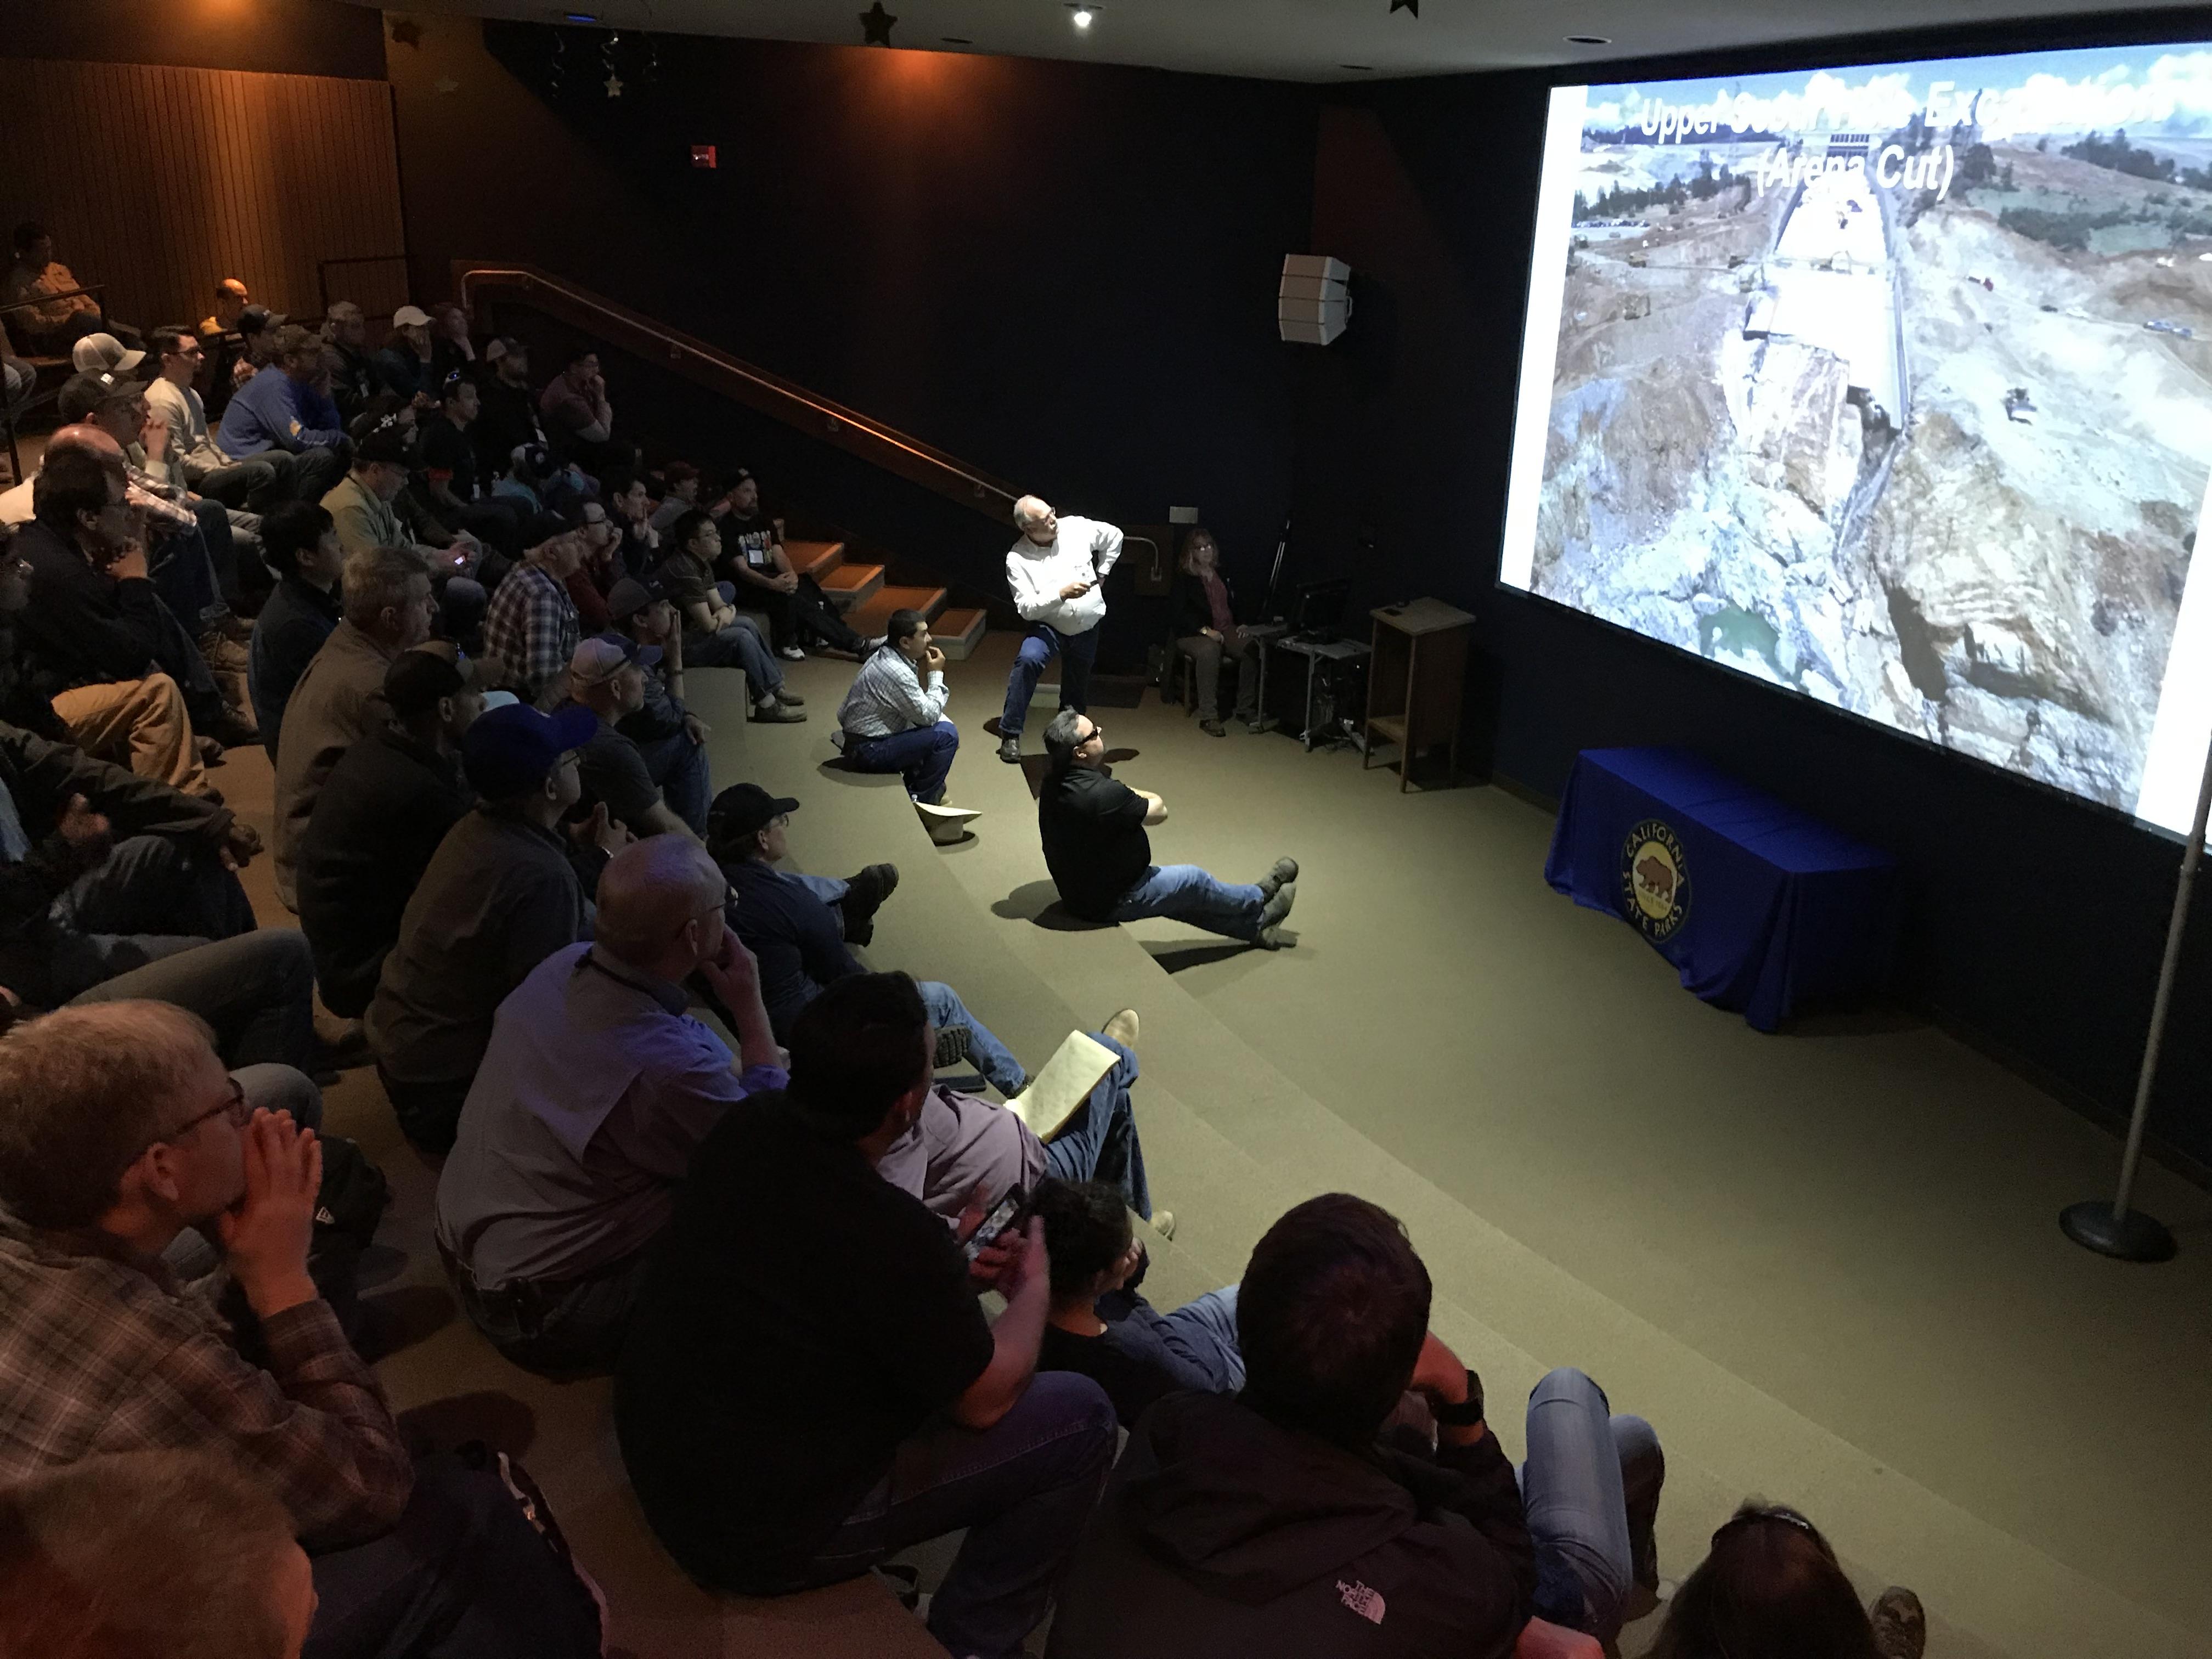 Steve Verigin Giving Lecture at Oroville Dam Visitors Center